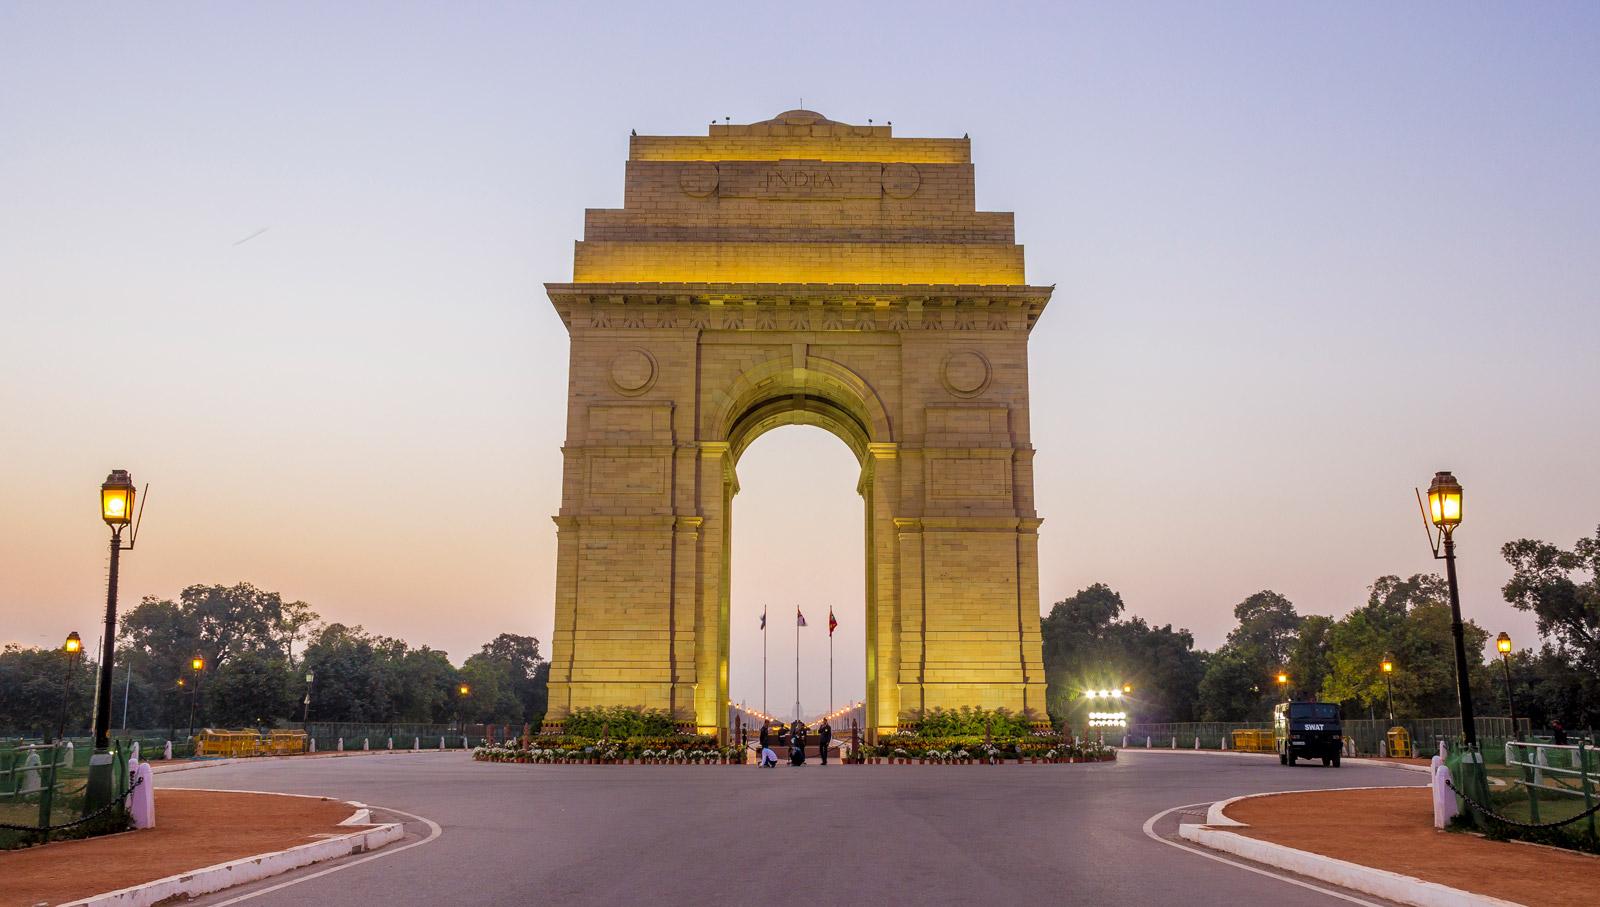 Delhi City in India